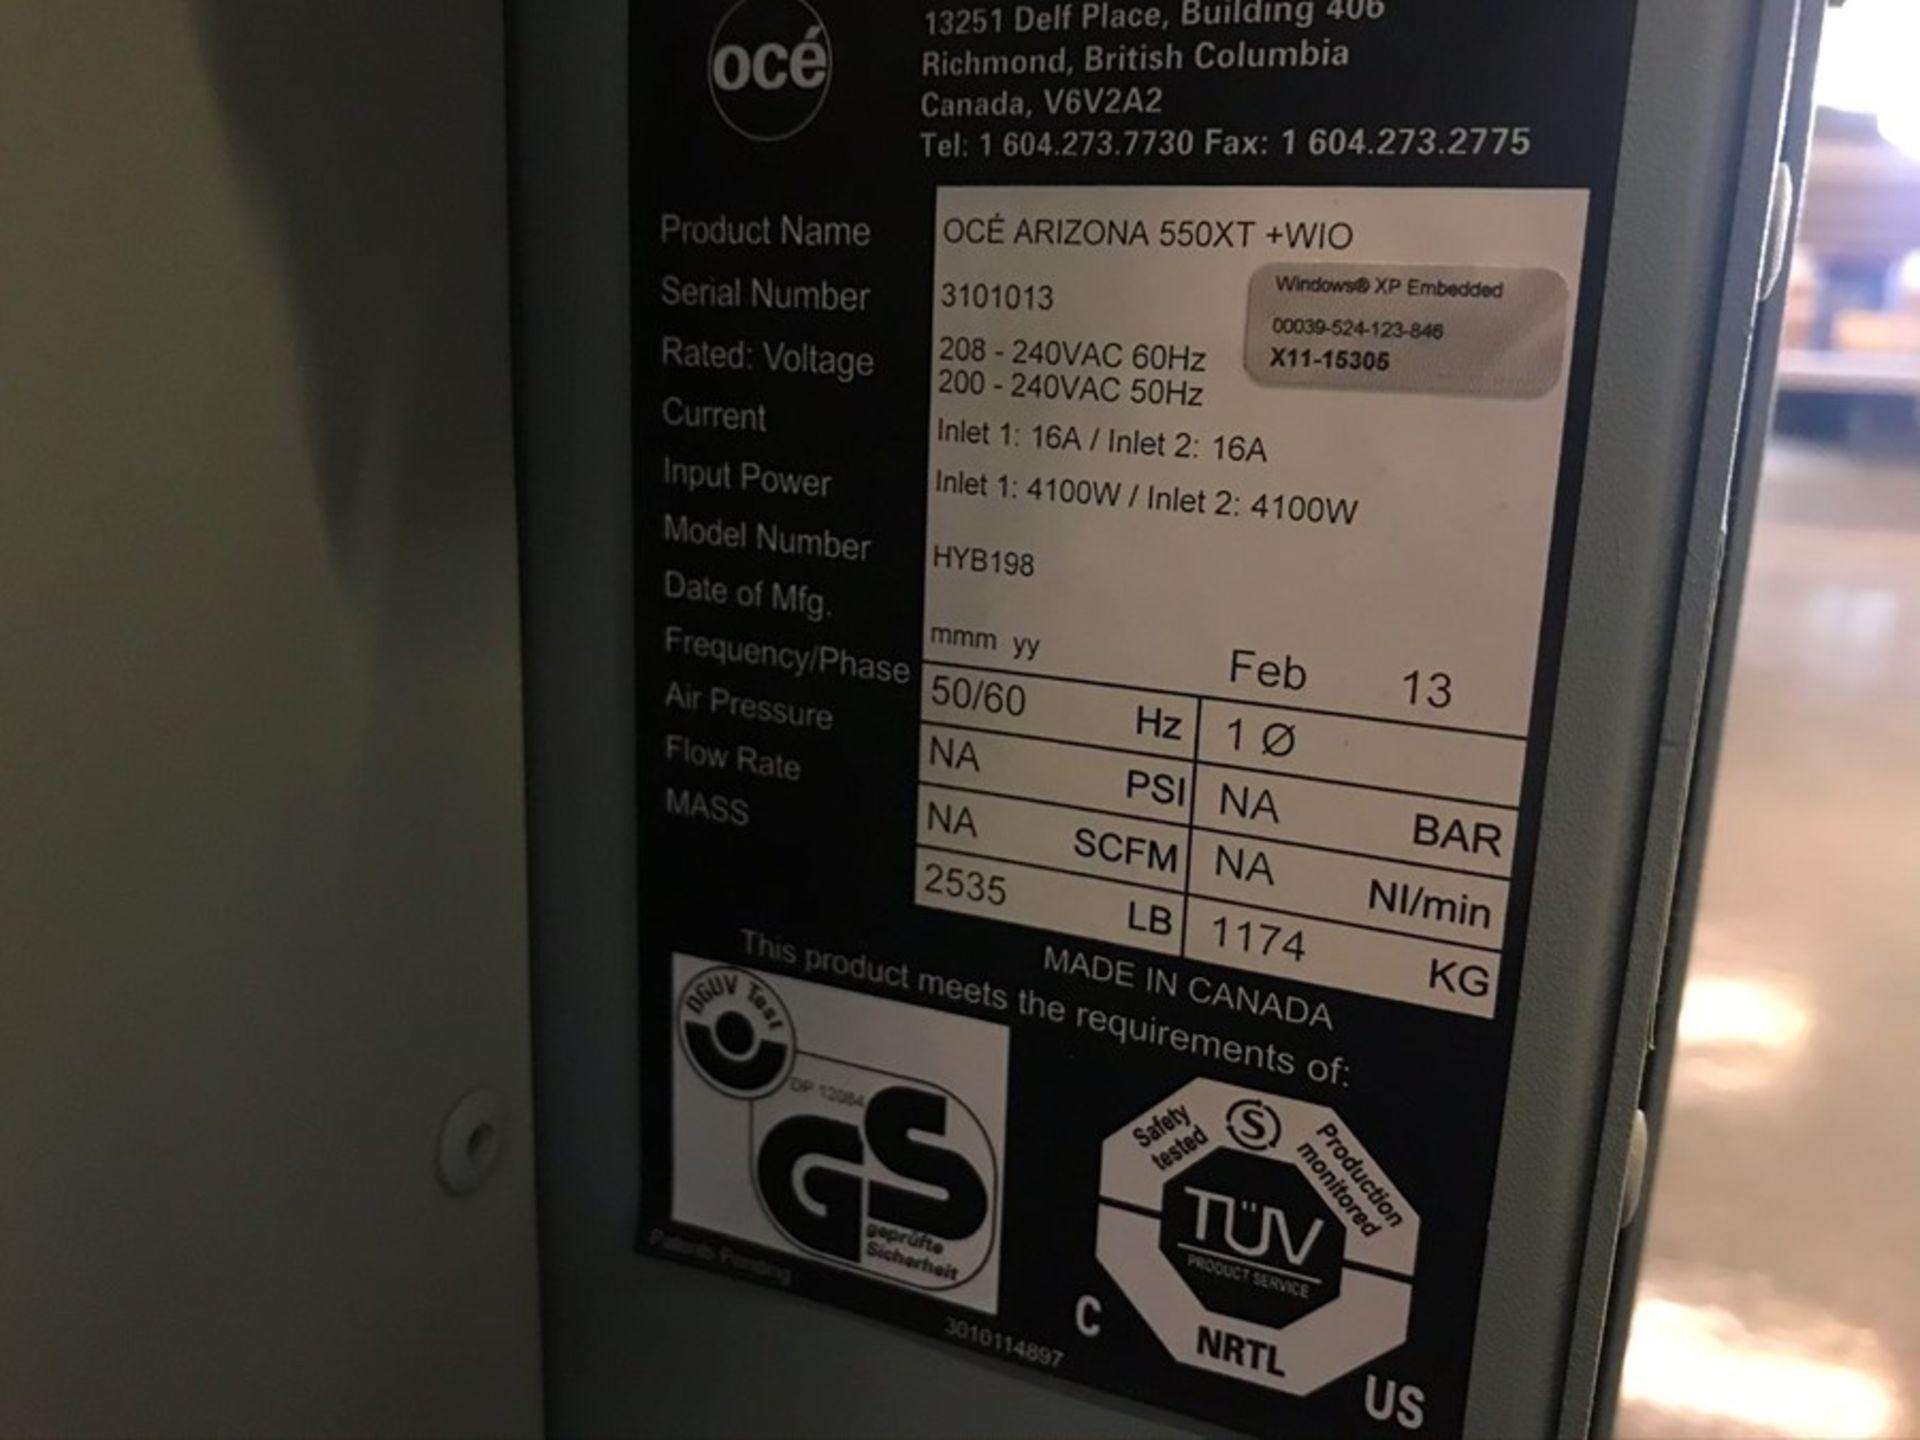 Oce Arizona 550XT + WIO UV flatbed printer (2013) - Image 7 of 22